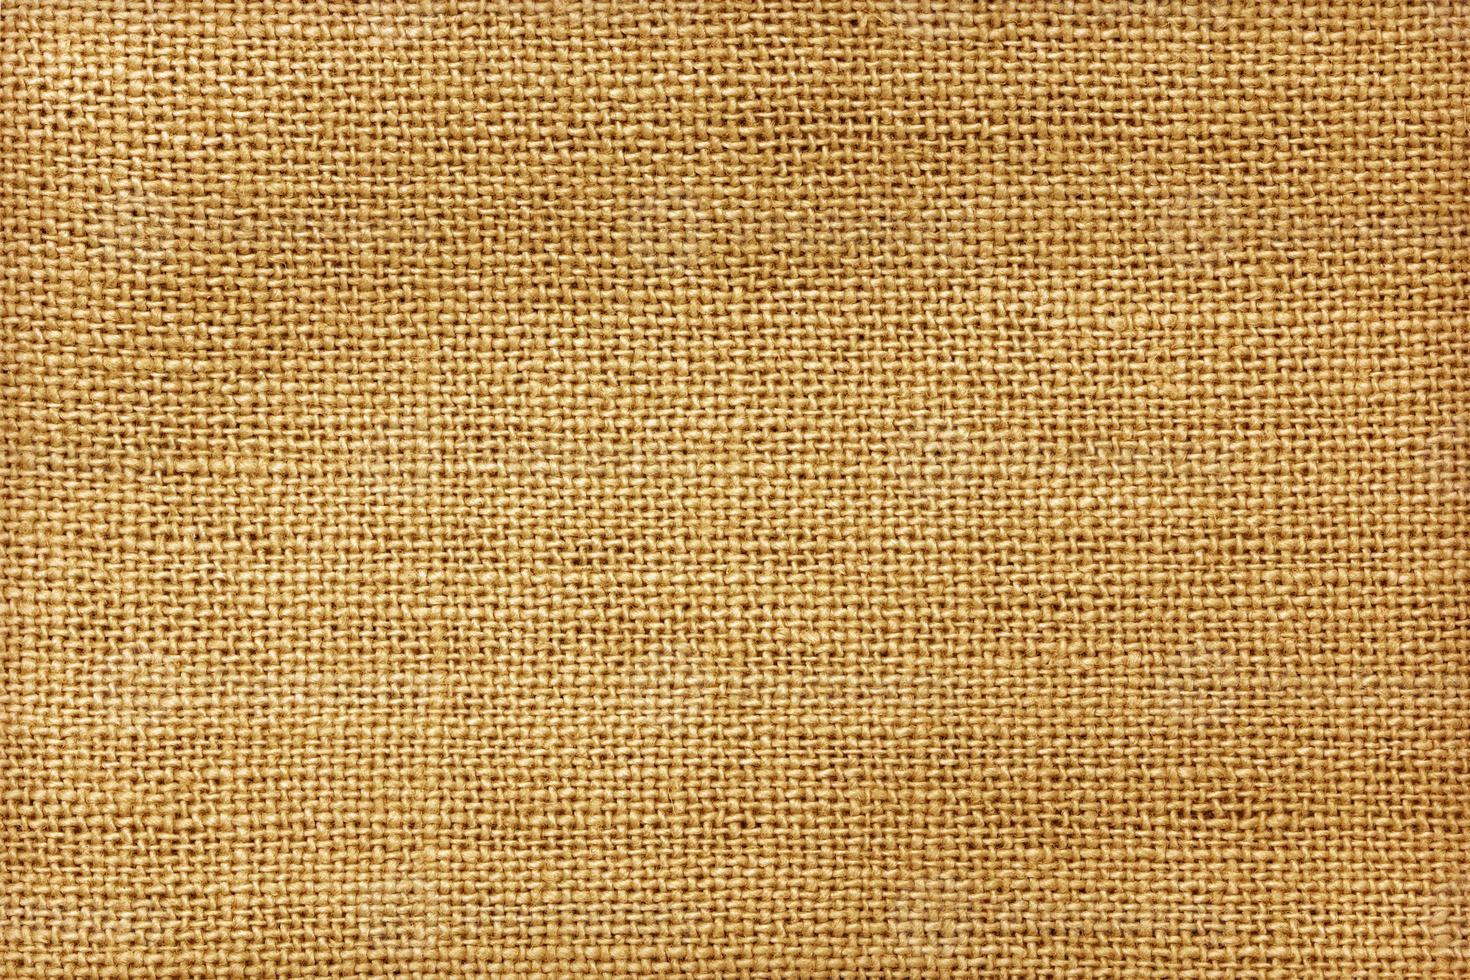 sackcloth textured background photo